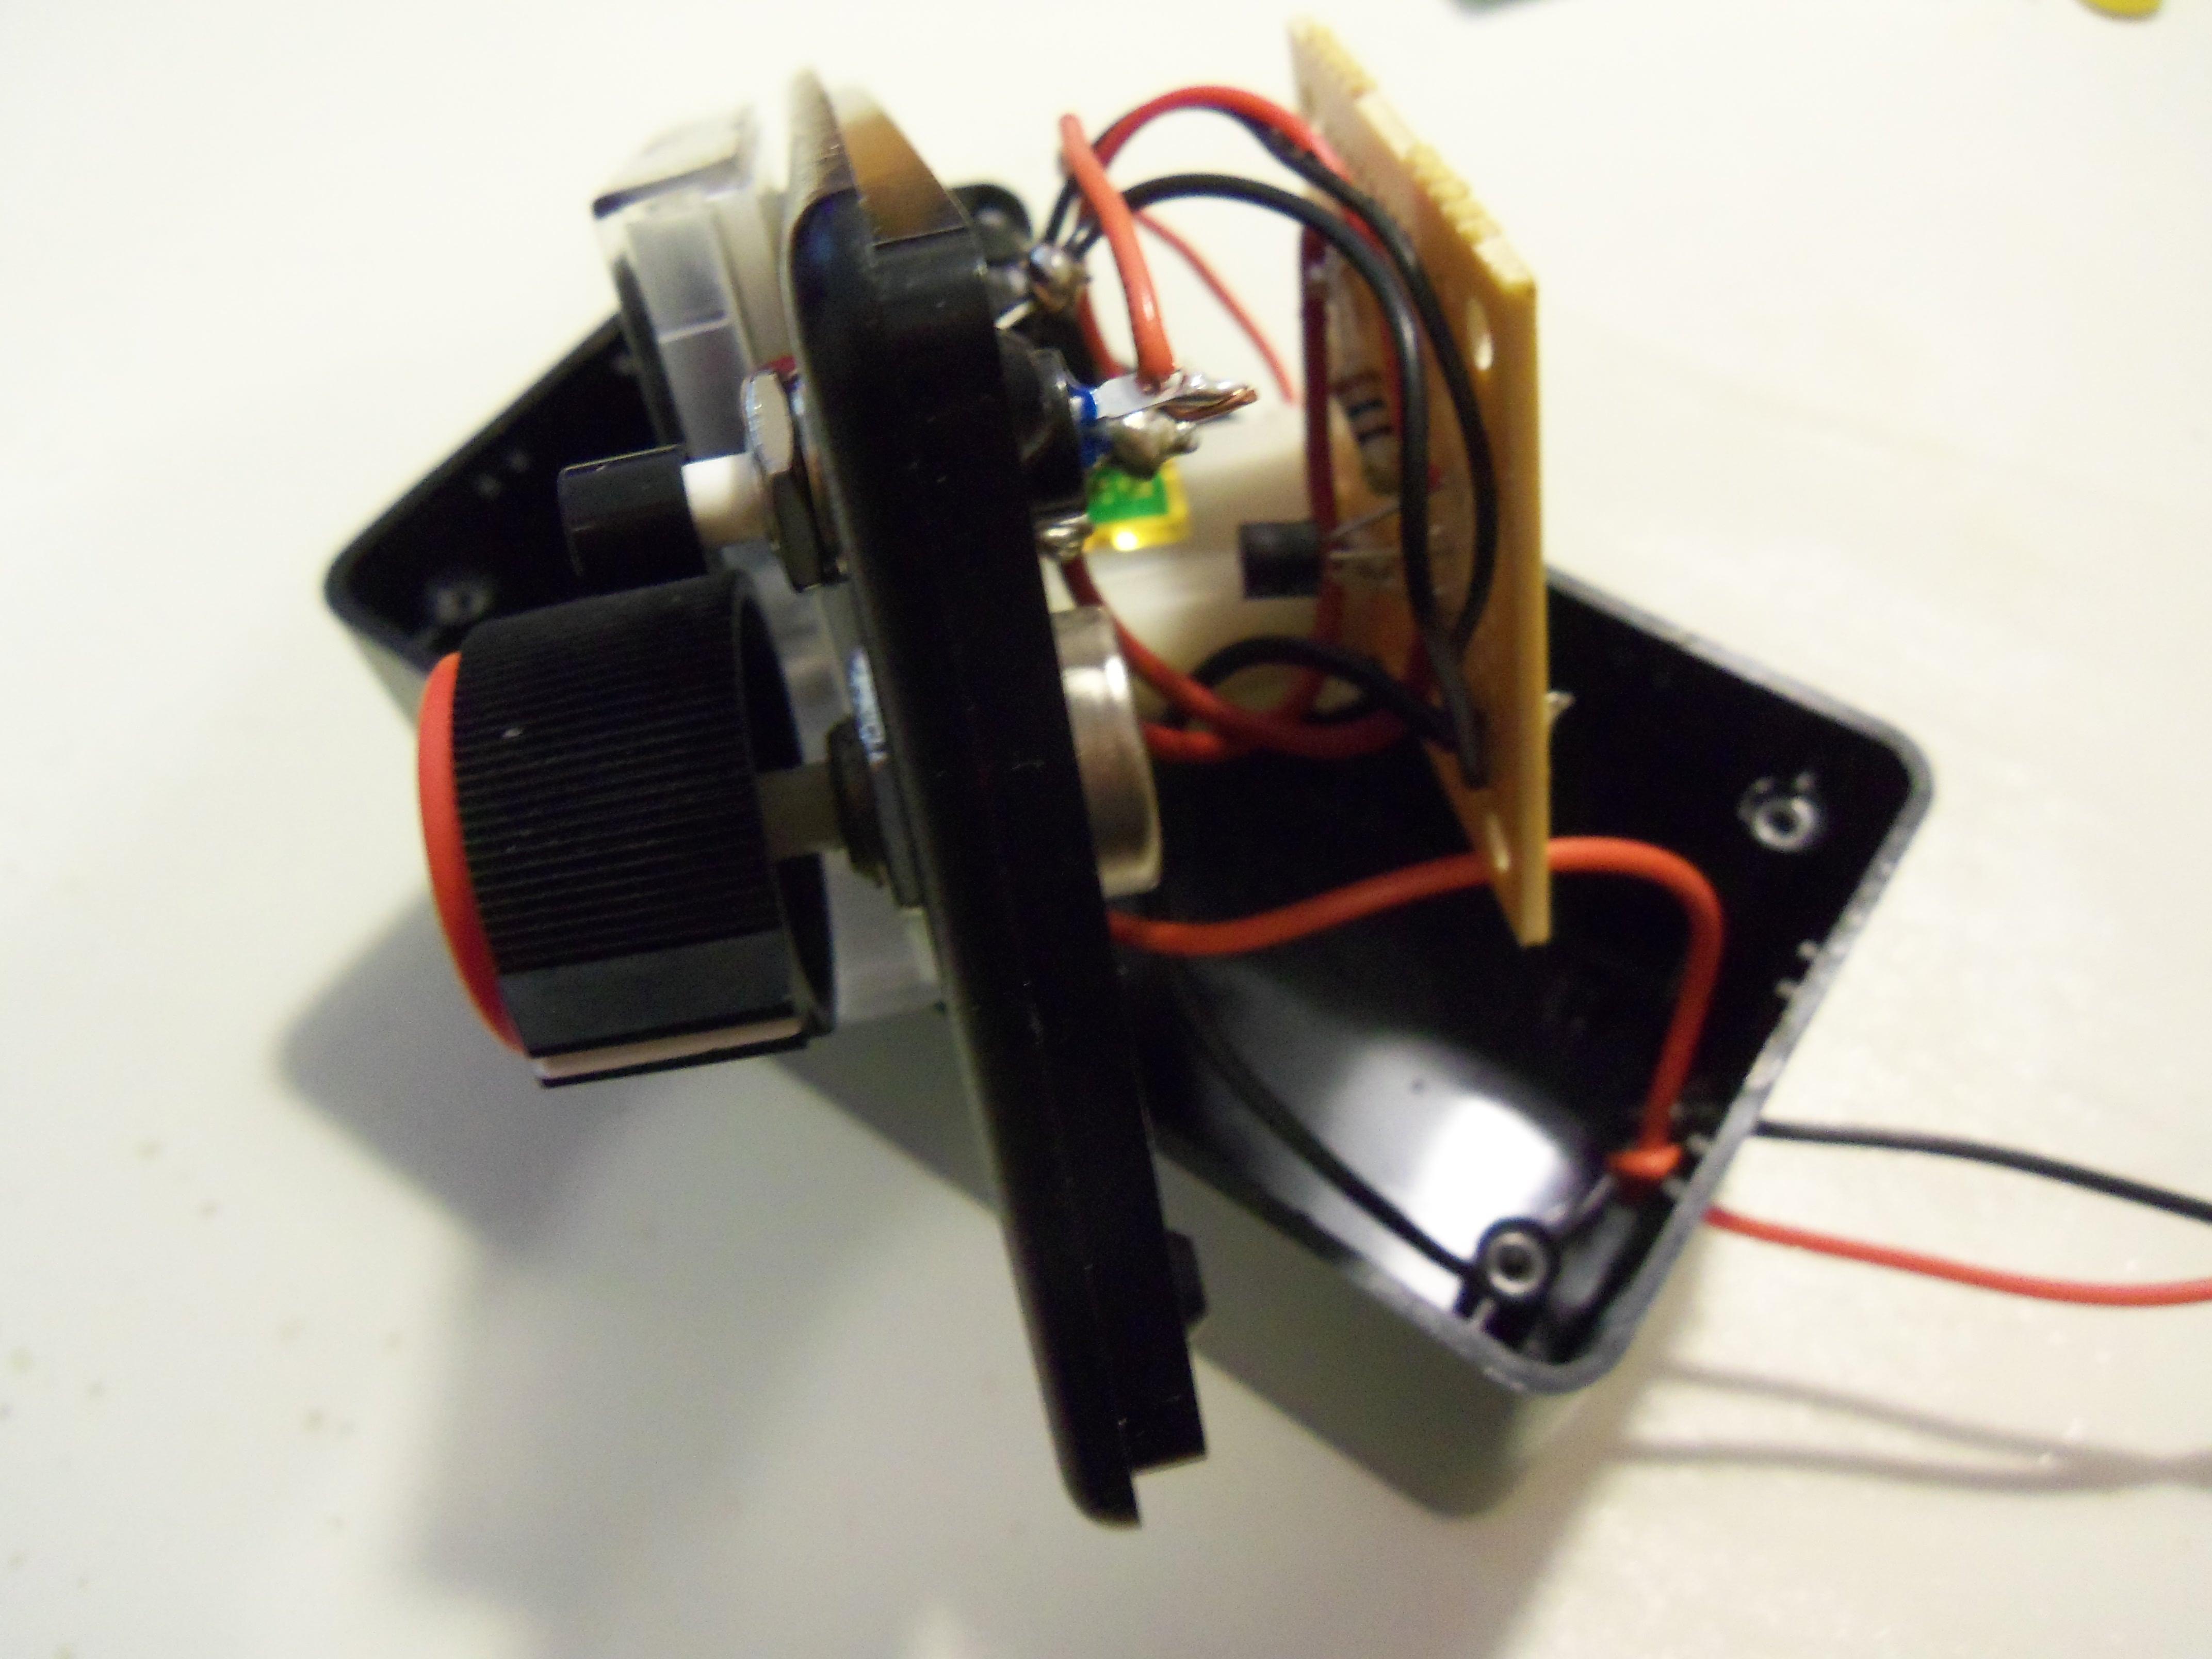 user built tdcs research device speakwisdom 100 1170